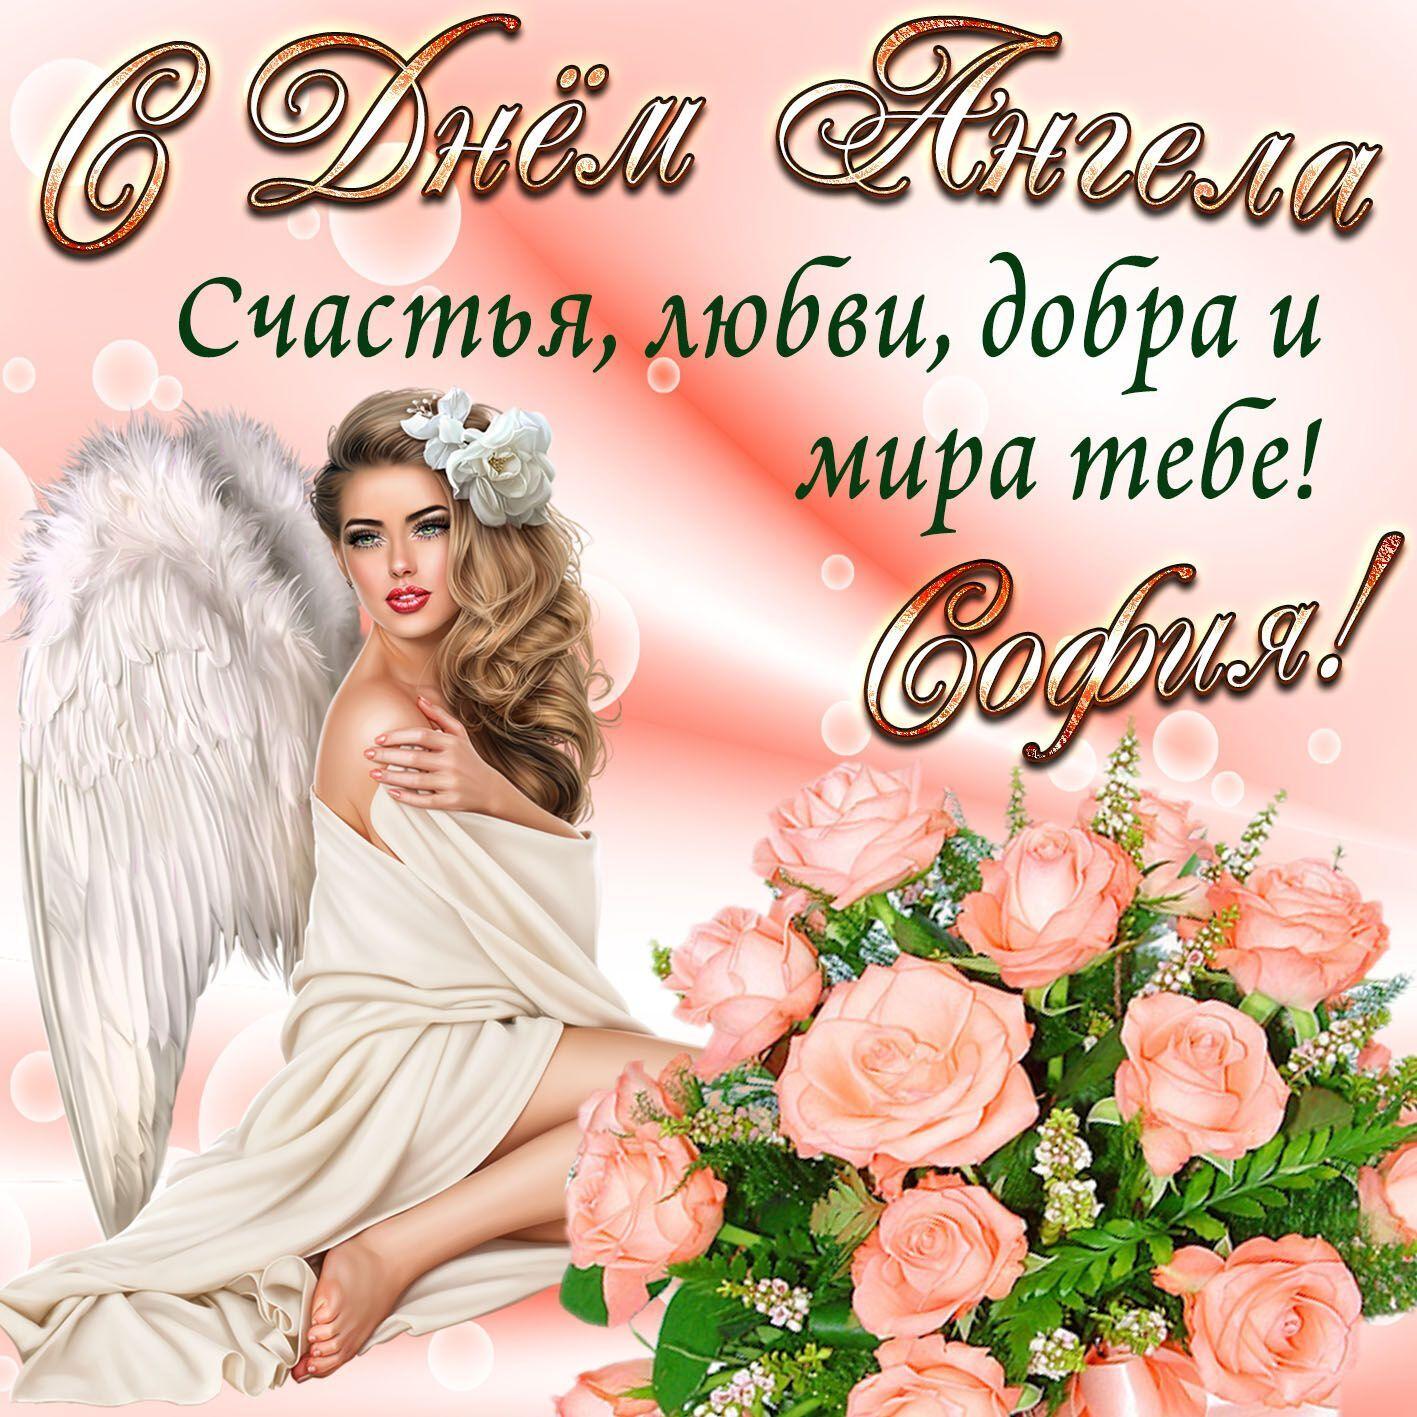 Картинка в день ангела Софії